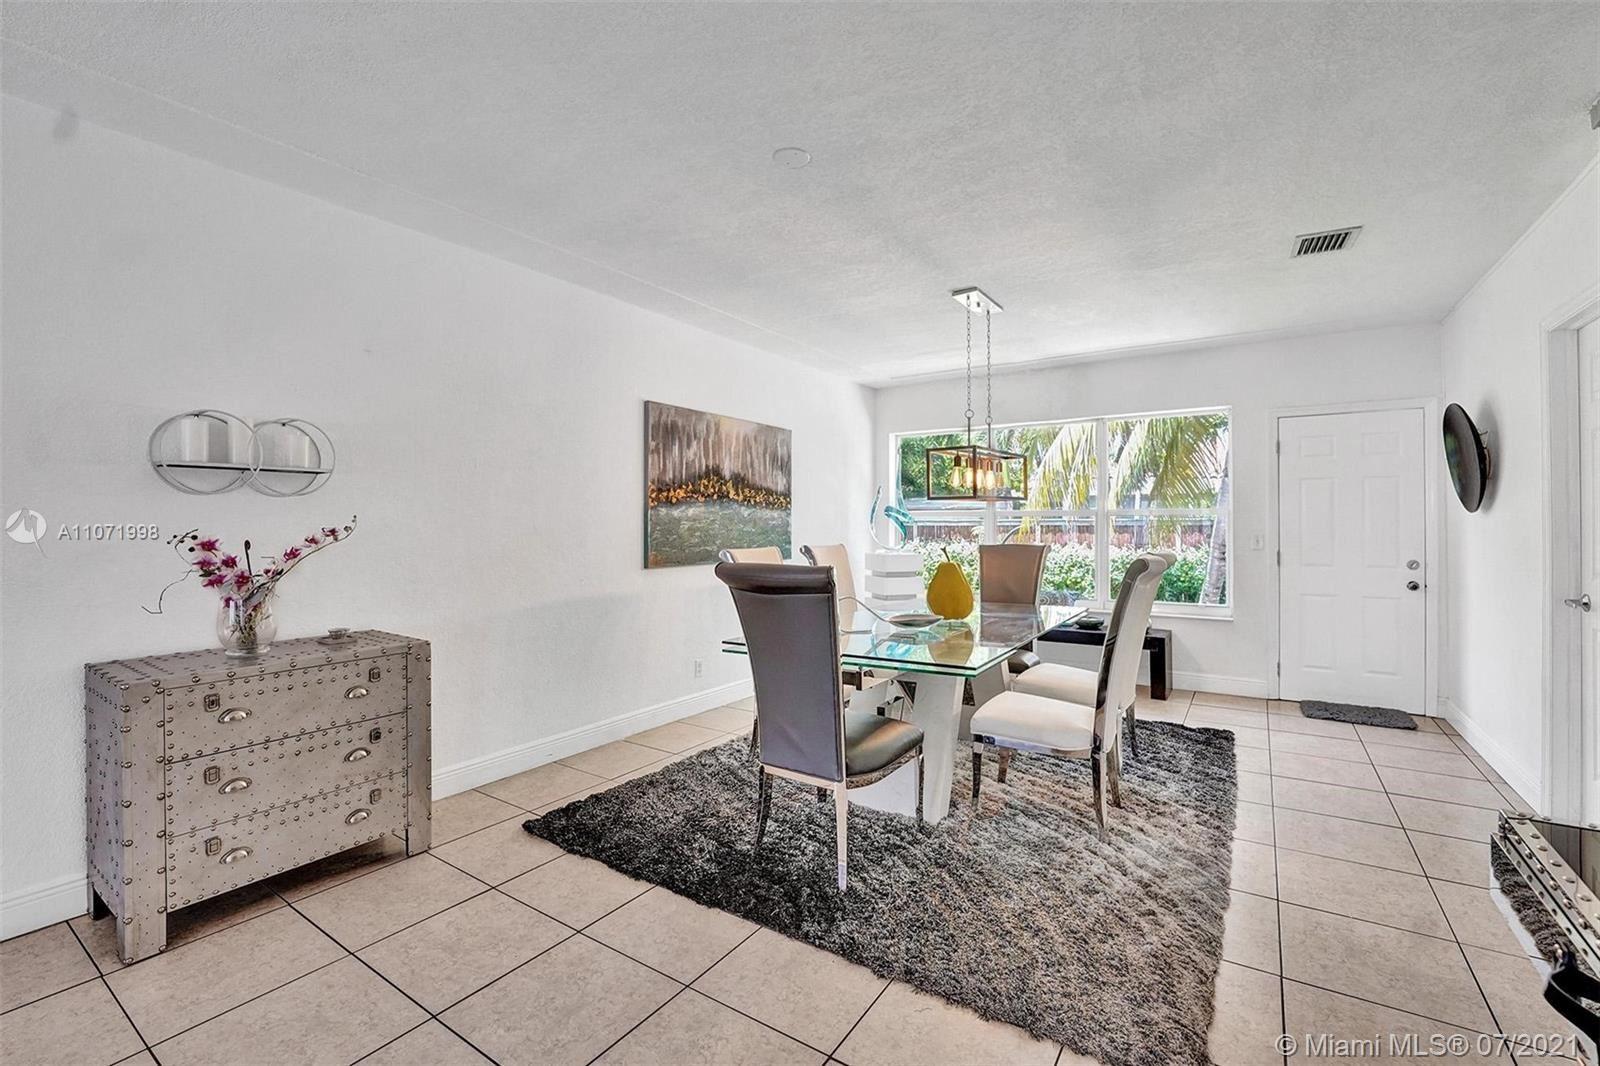 9272 Harding Ave, Surfside, FL 33154 - #: A11071998